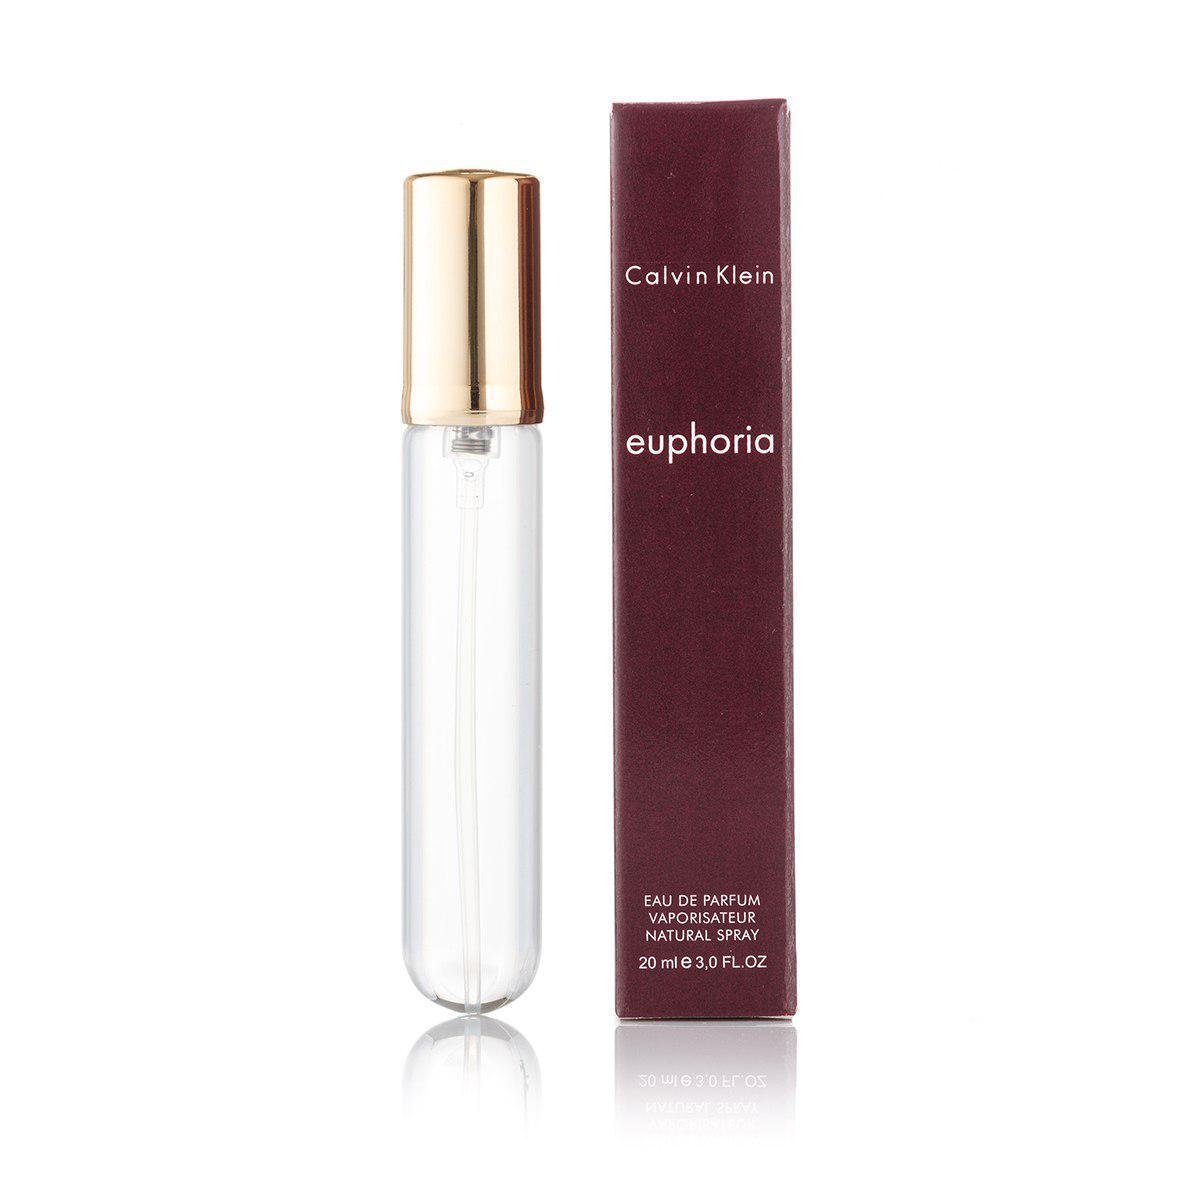 Жіночий парфум Calvin Klein Euphoria - 20 ml